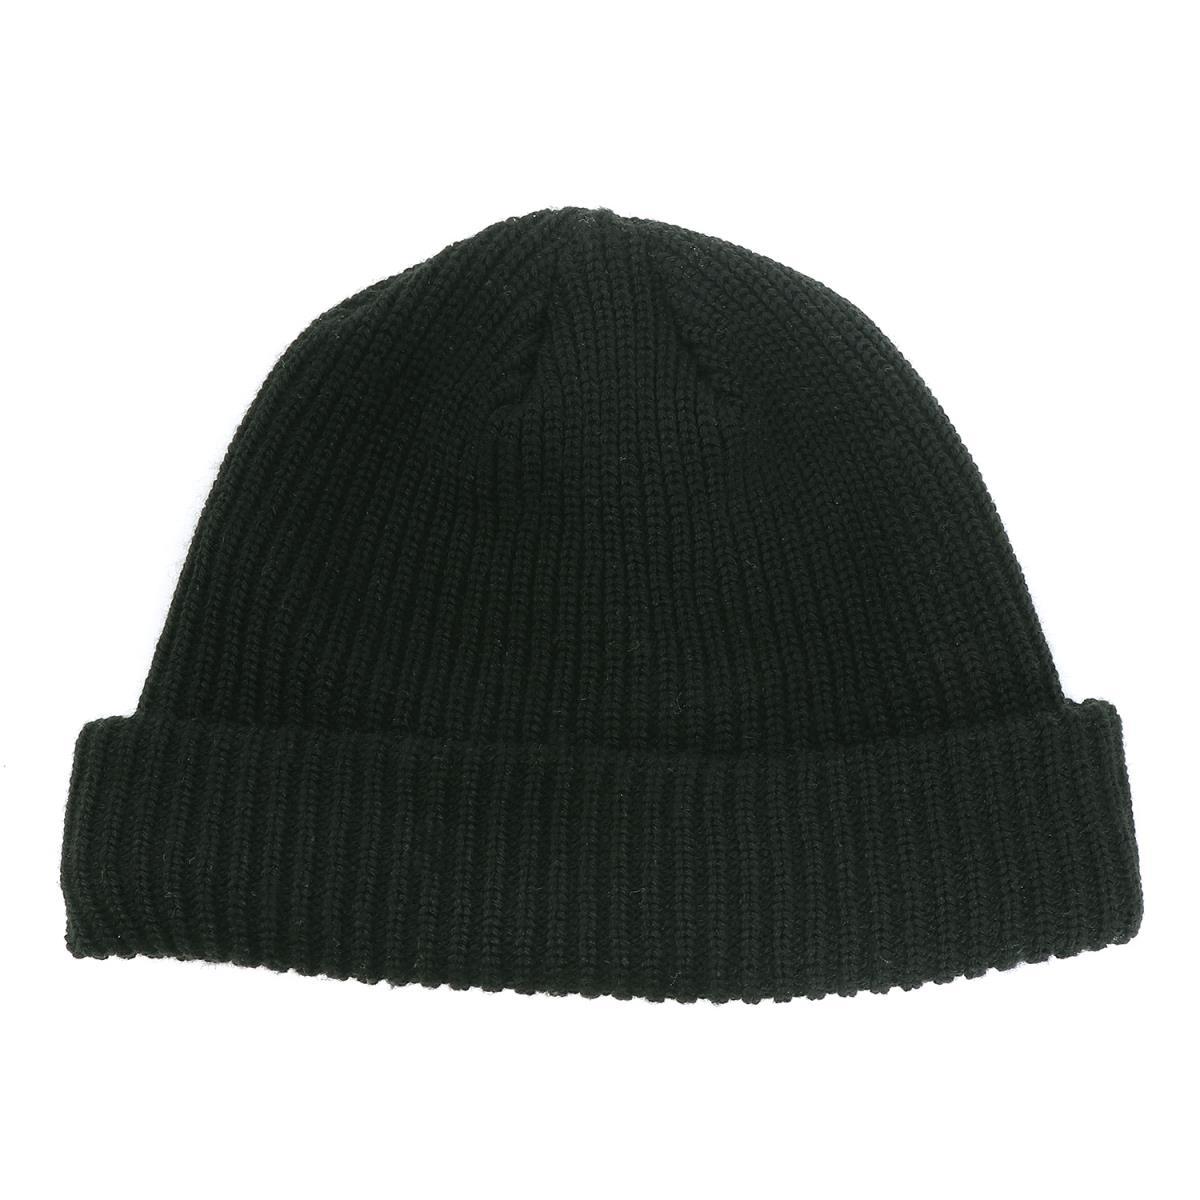 1570166c9a9 Supreme (シュプリーム) 17A W script logo acrylic knit beanie (Loose Gauge Beanie)  black